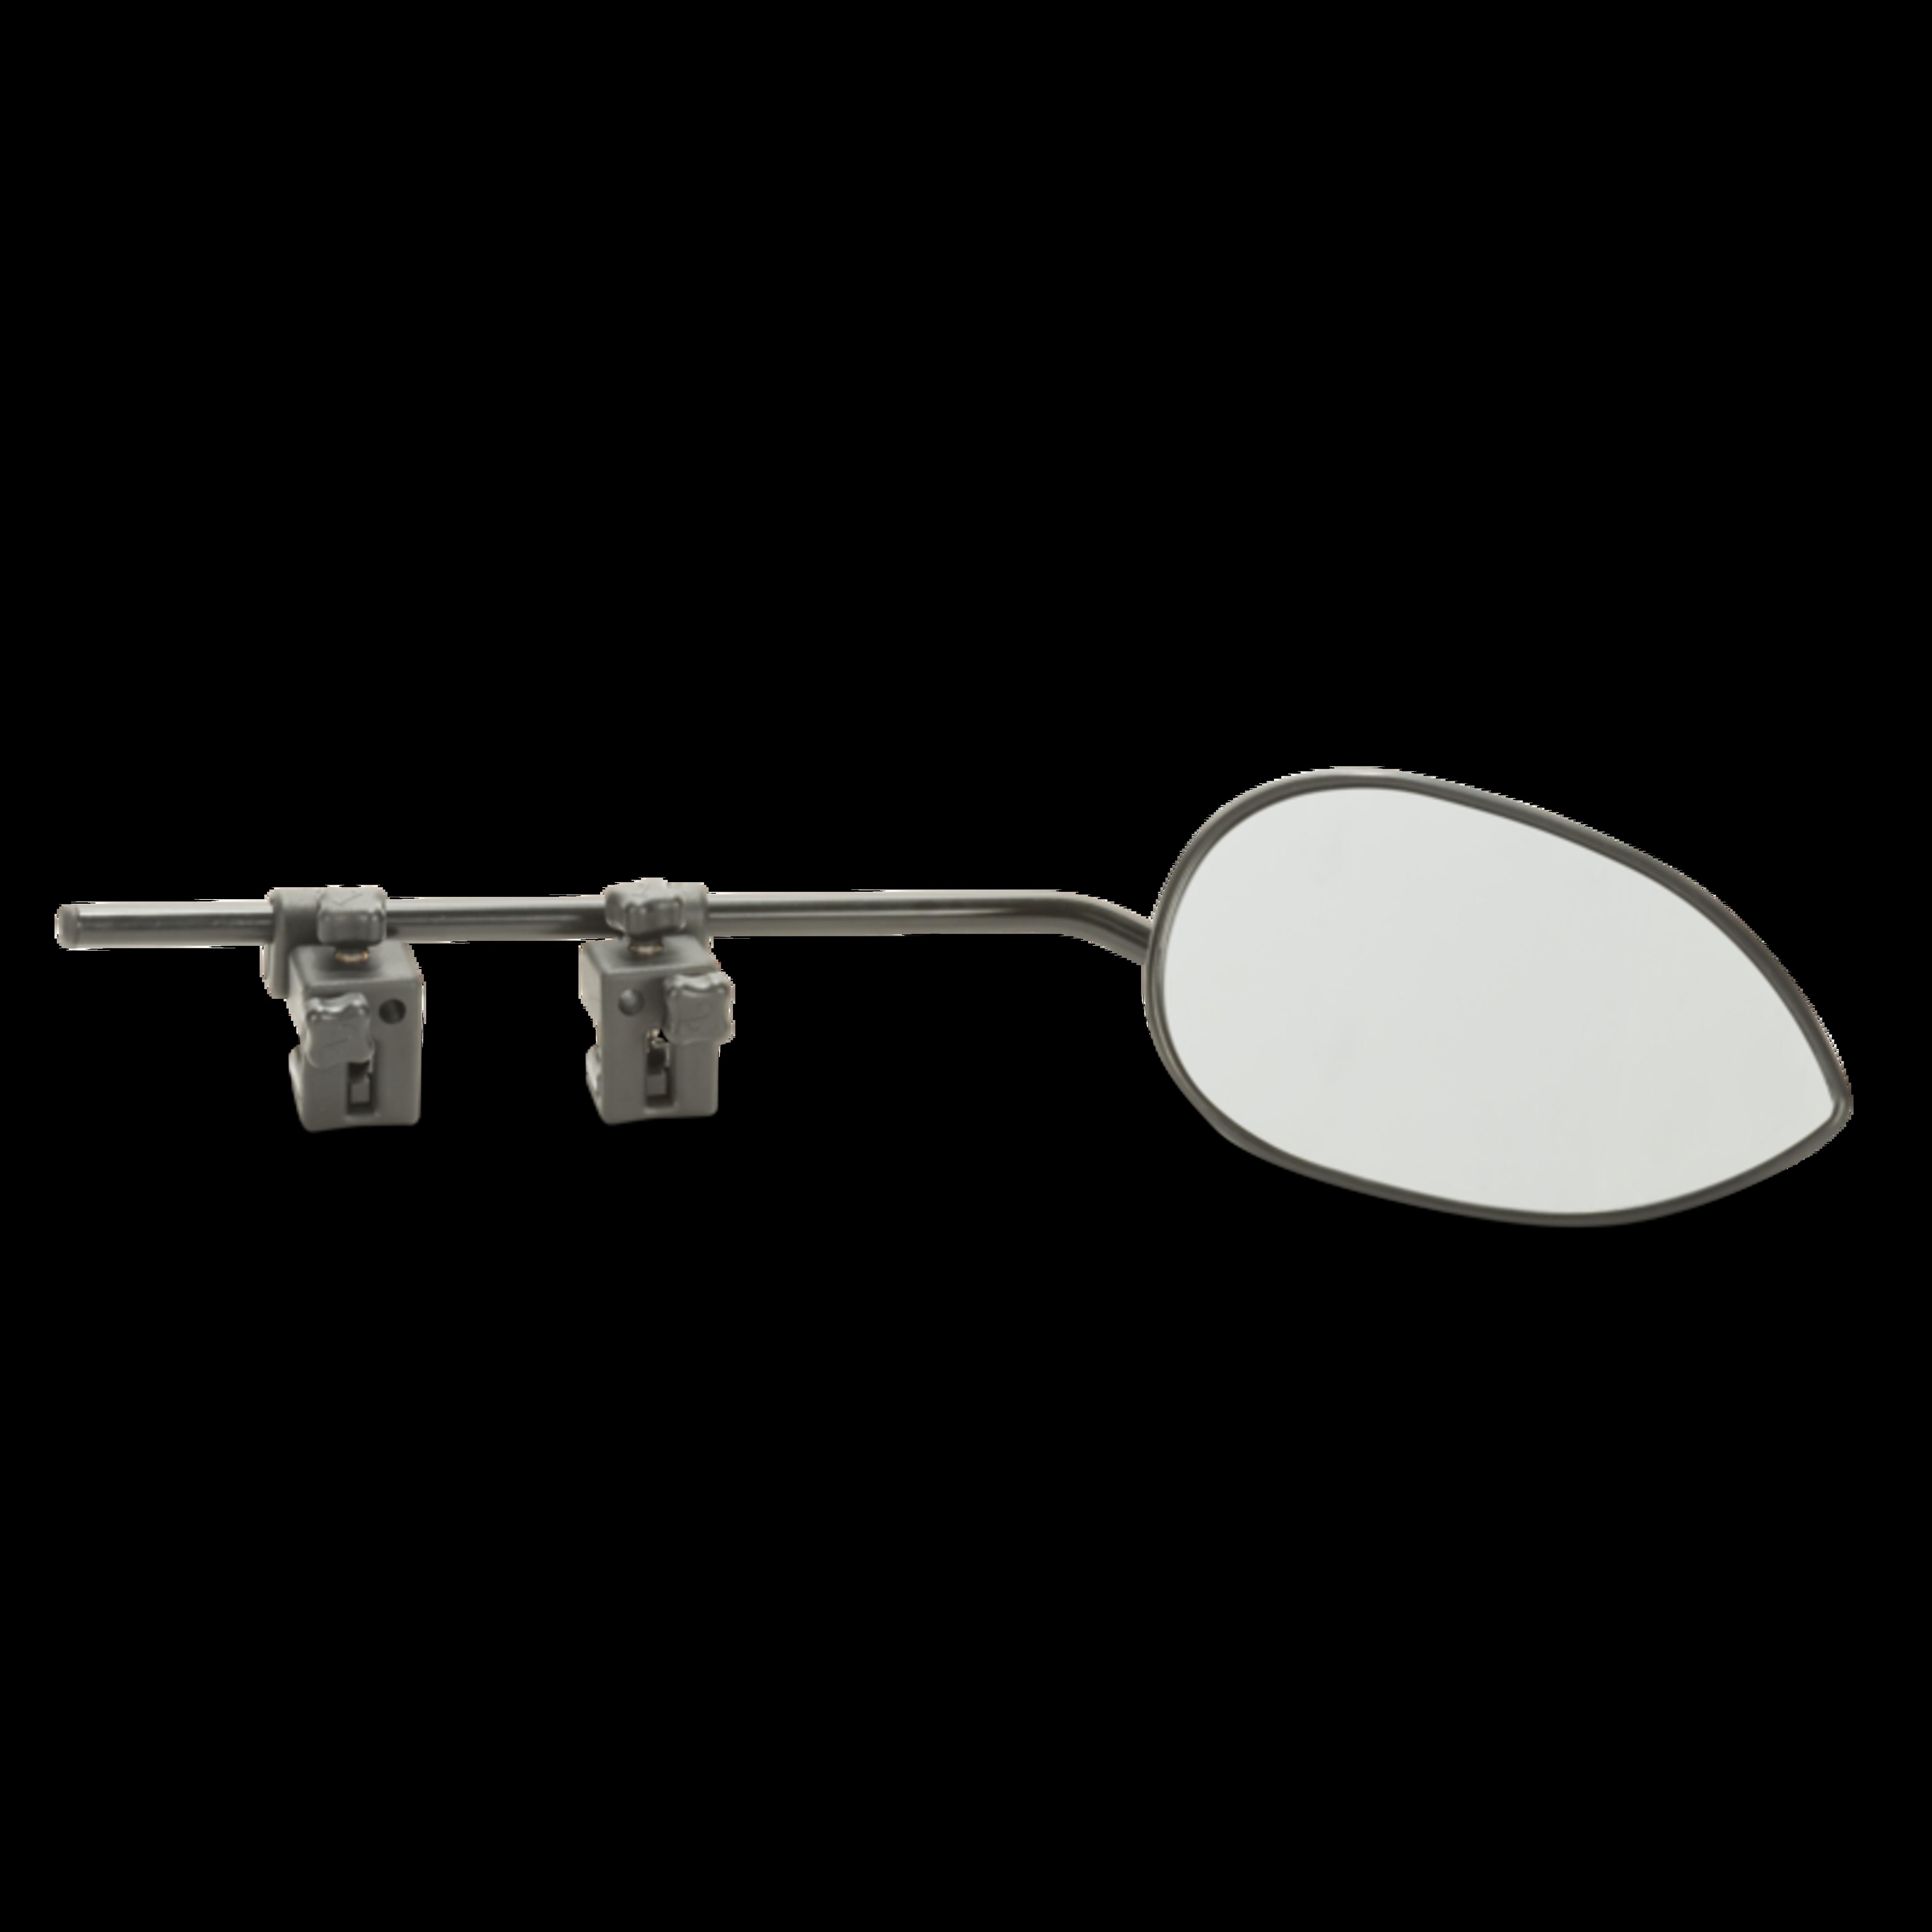 Case Milenco Grand Aero Towing Mirrors Twin Pack